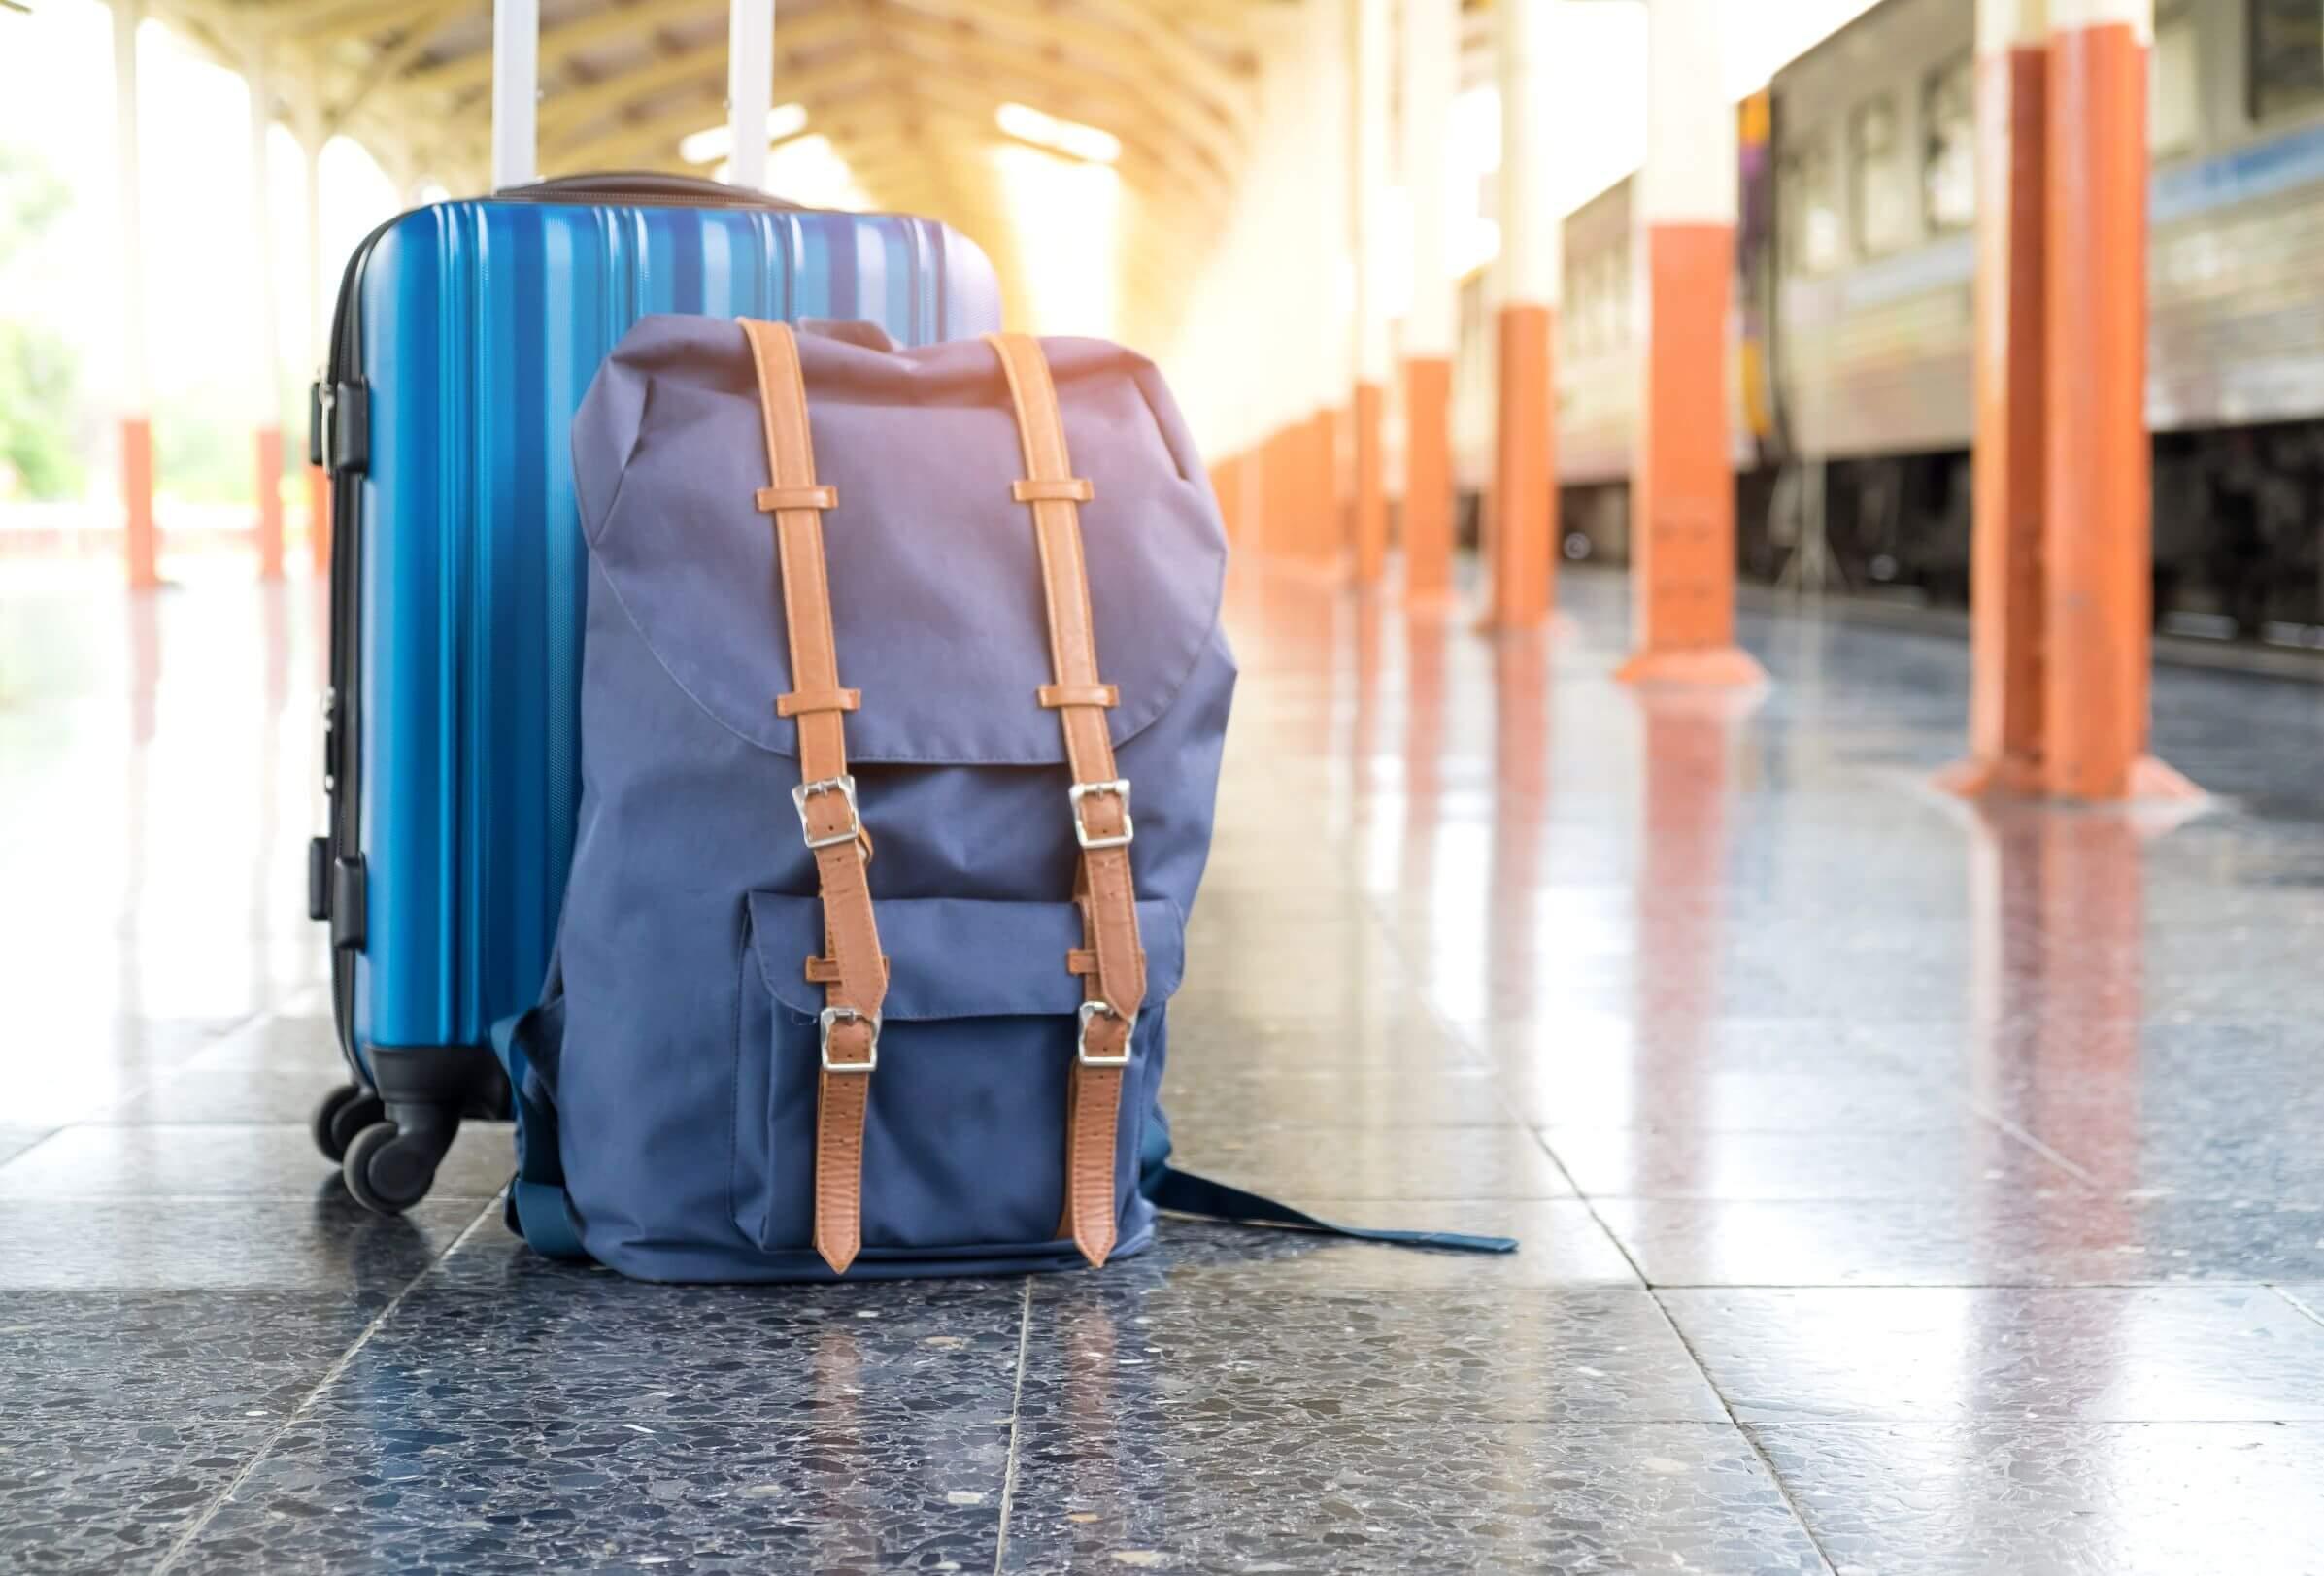 travel-concepts-travel-luggage-on-the-platform-2021-04-02-22-21-28-utc (1)